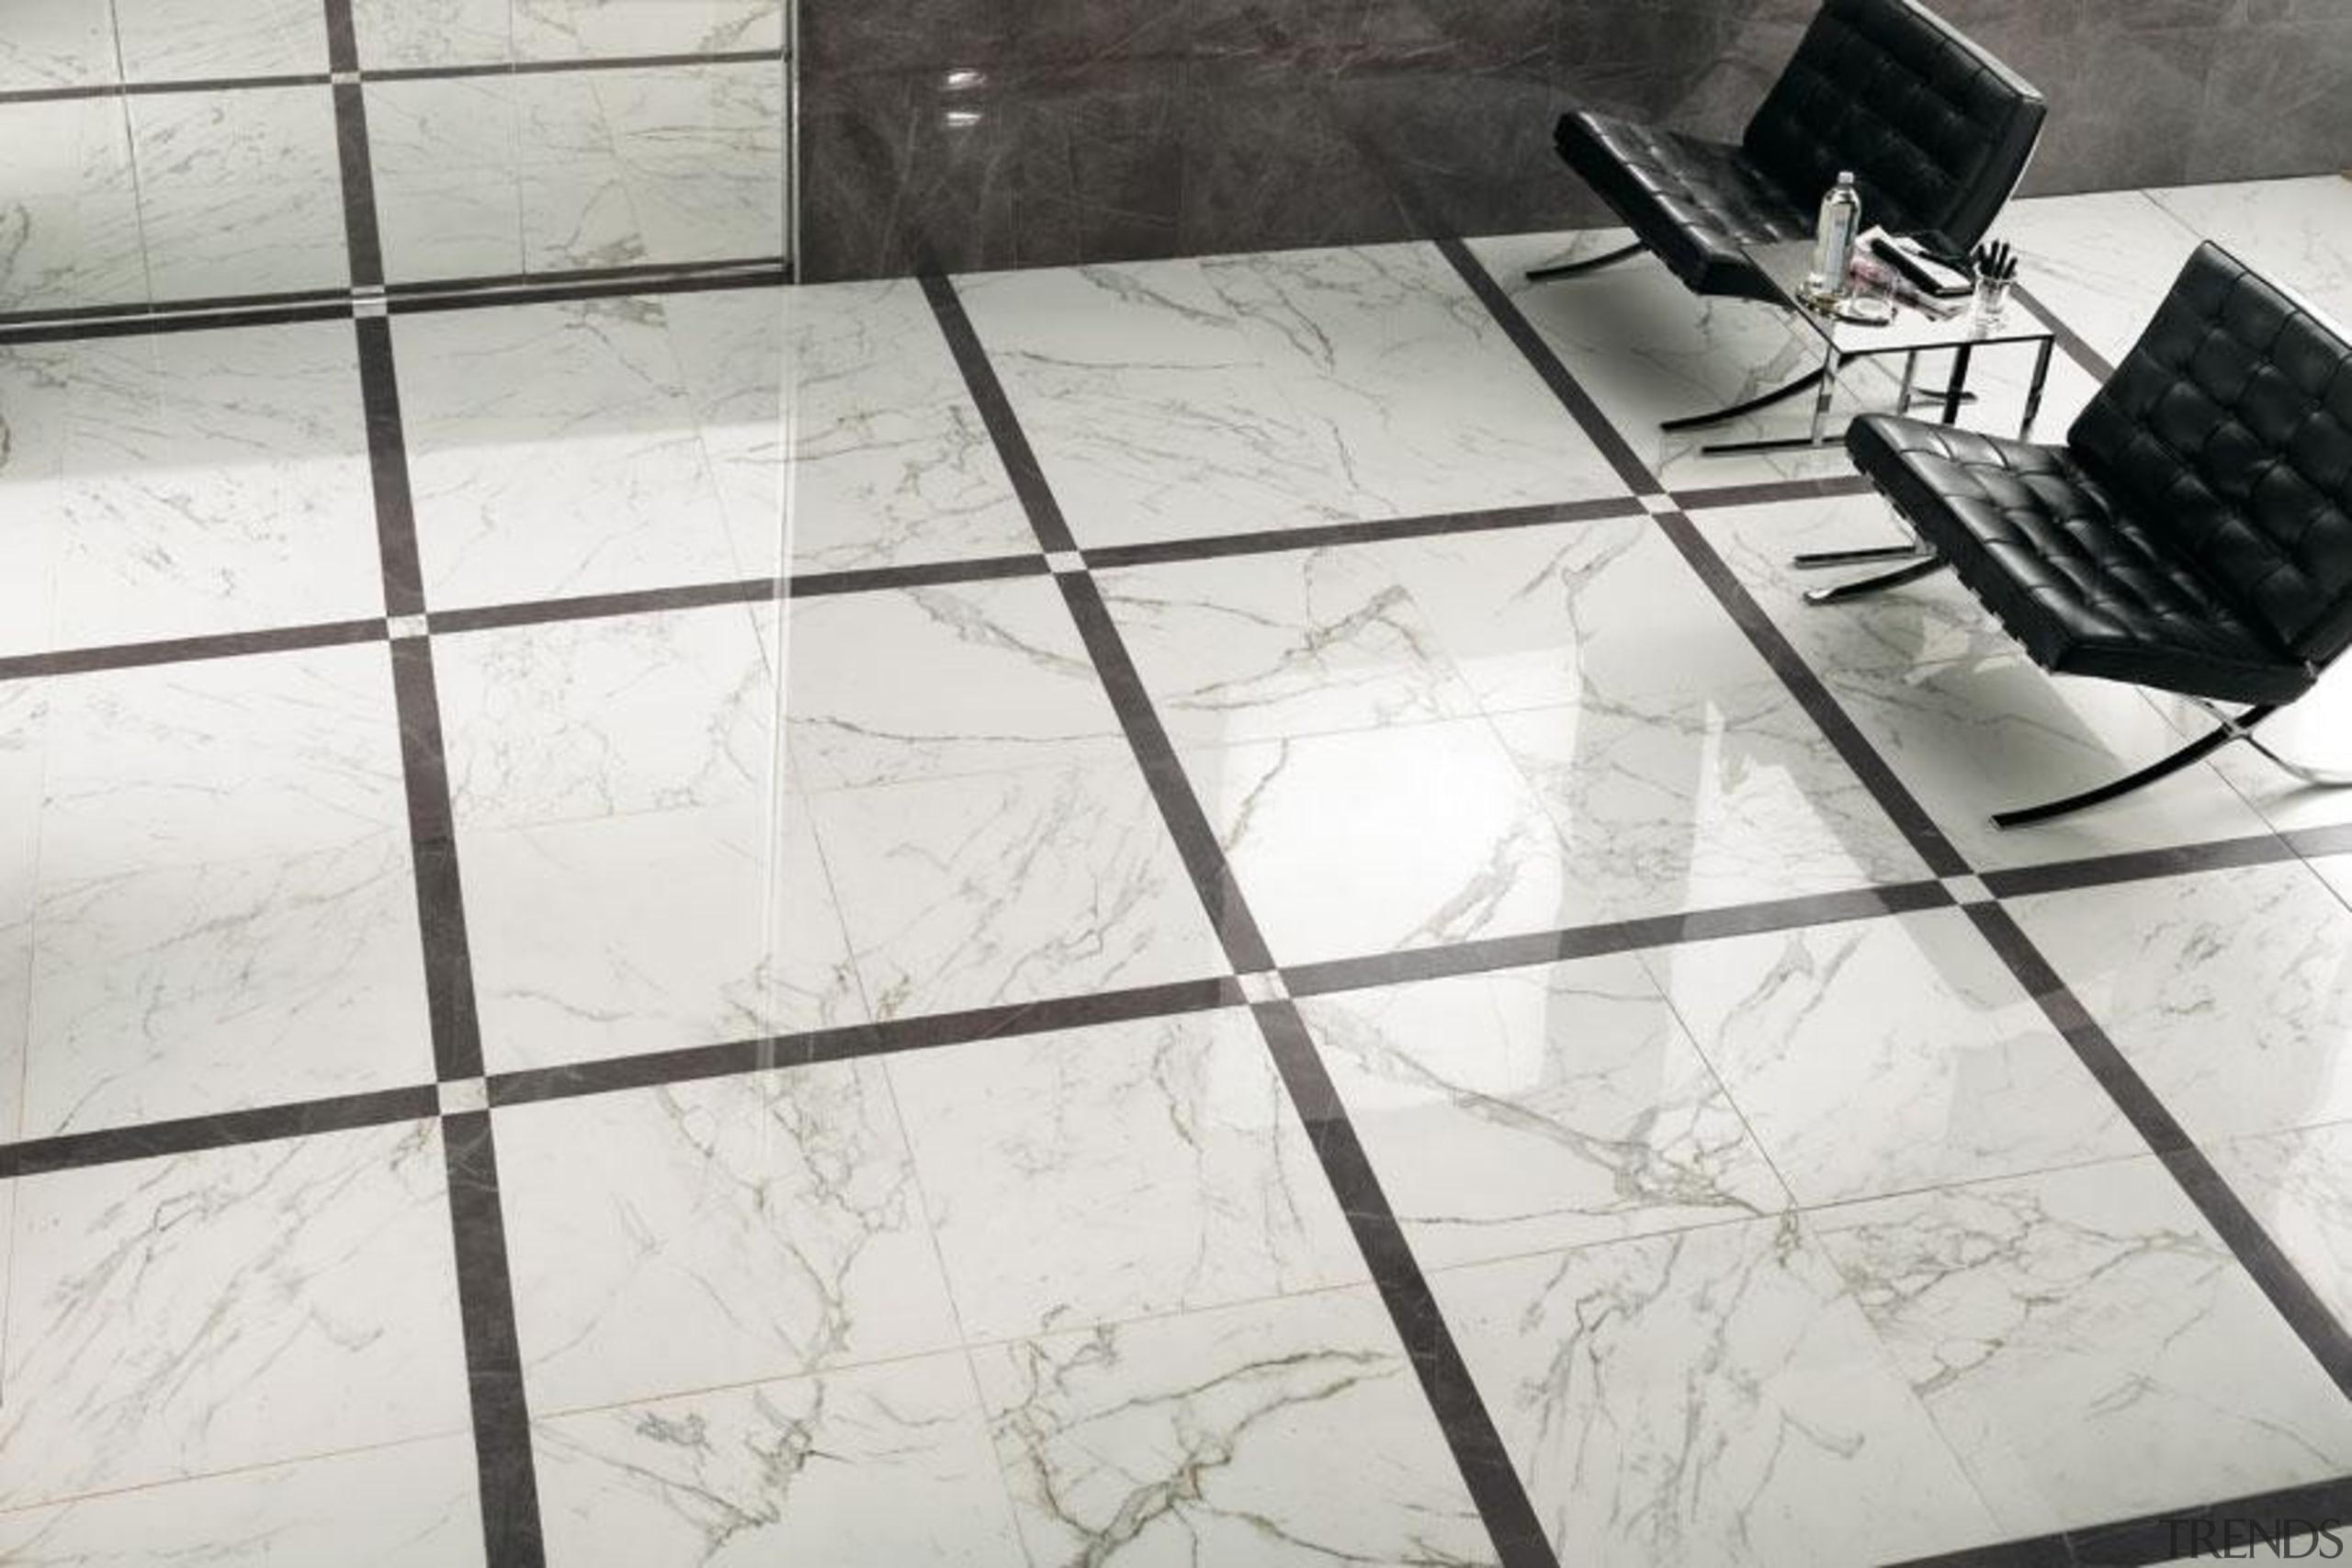 Calacatta interior floor tiles - Cb 4141375049973260 - floor, flooring, product design, table, tile, white, gray